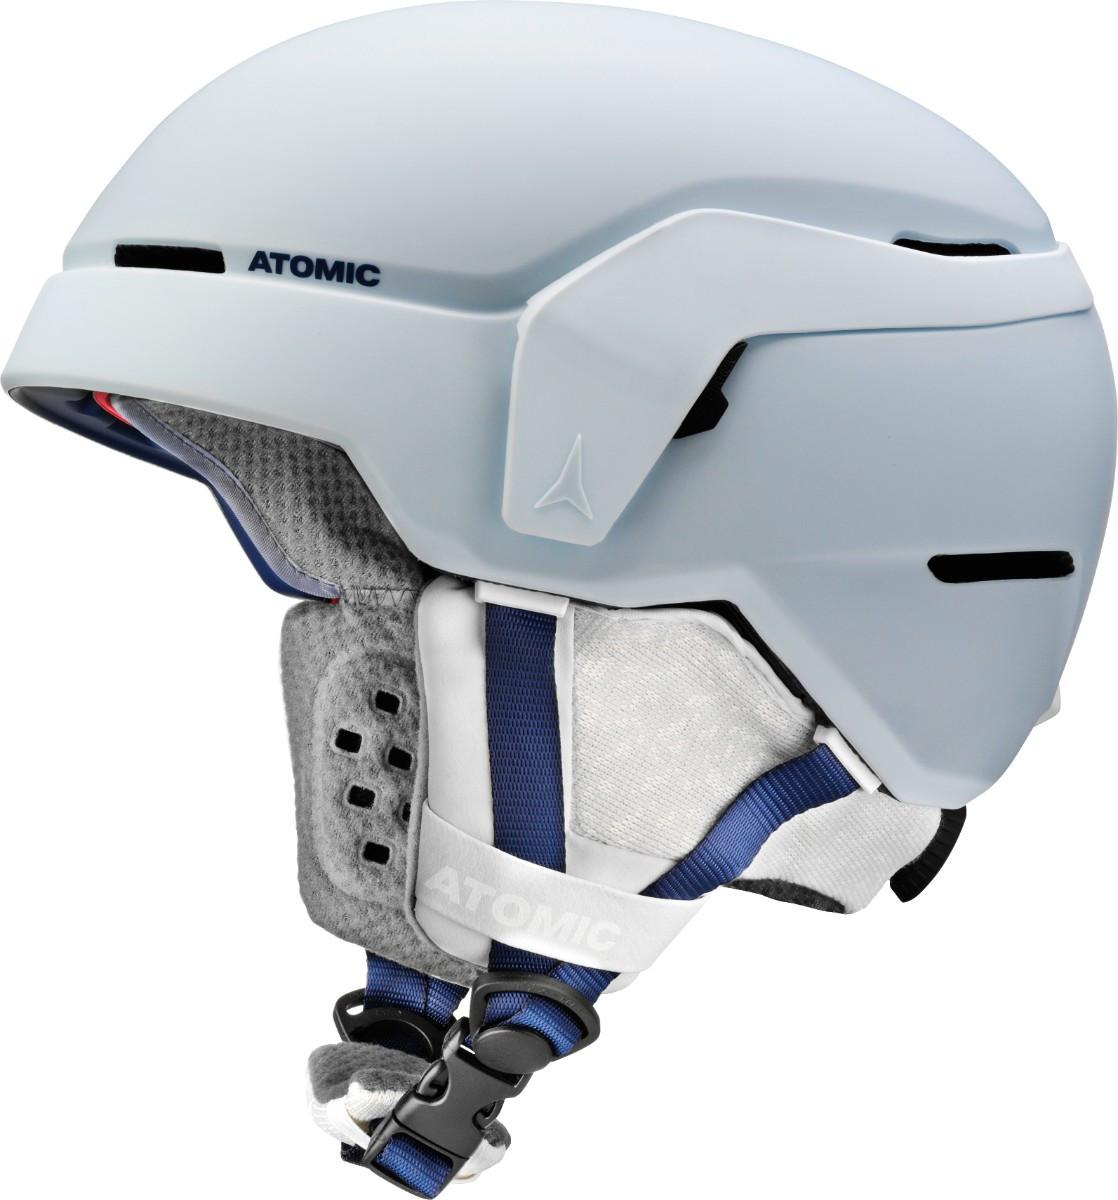 Atomic Count - modrá Velikost helmy: M 2019/2020